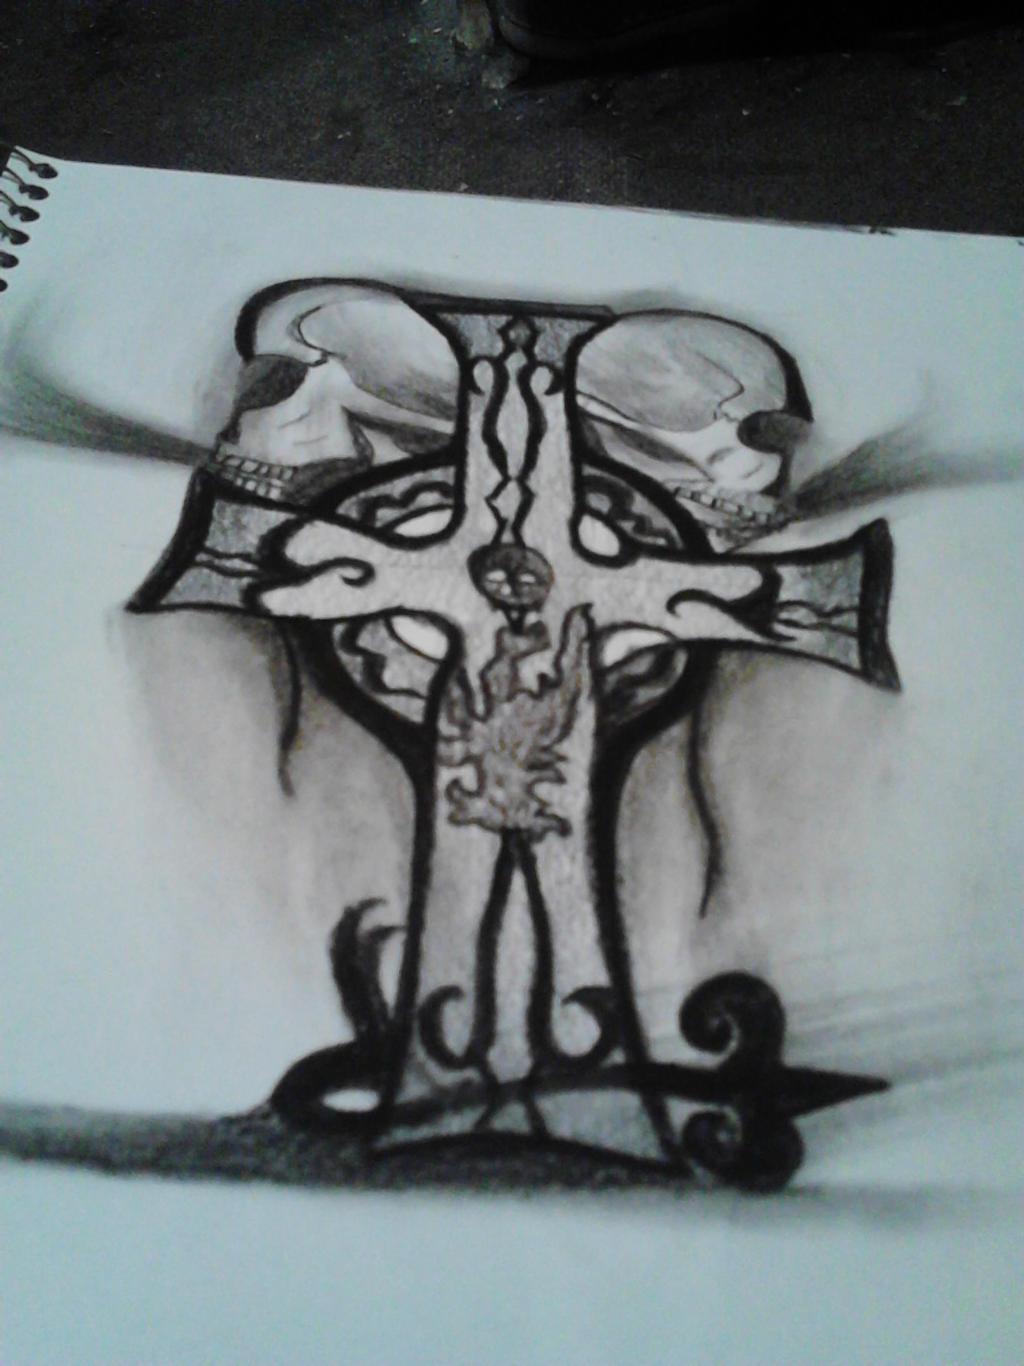 Celtic cross and skull tattoo design by chynna97 on deviantart for Celtic skull tattoo